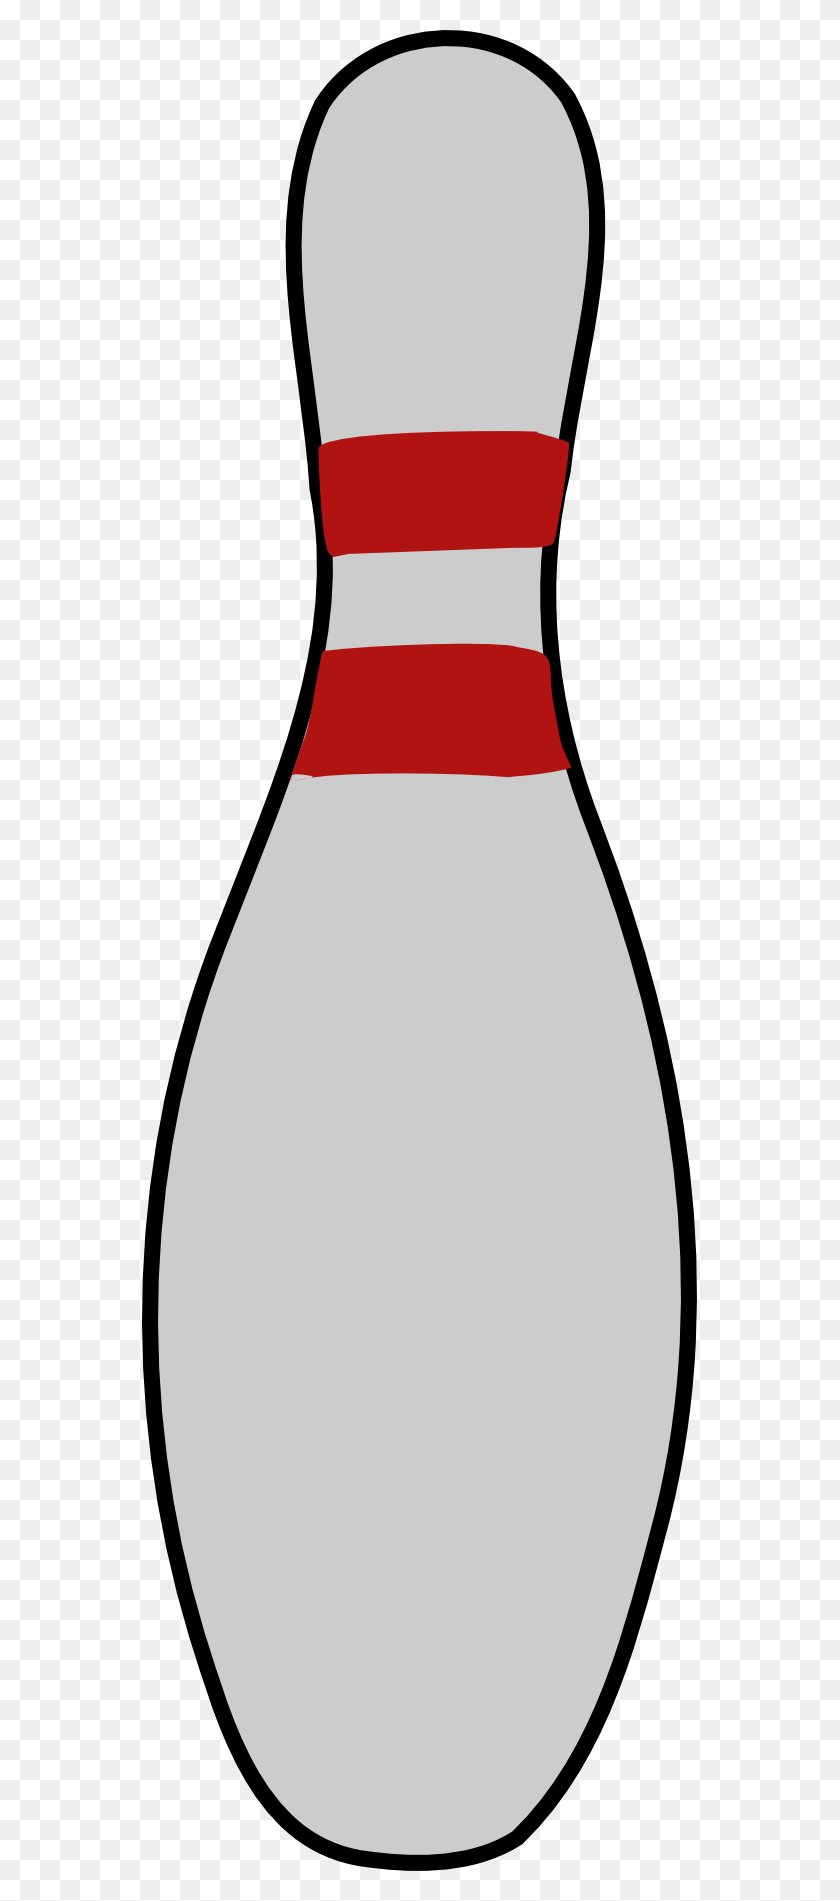 Bowling Ball Bowling Pin Clipart Black And White Bowling Cliparts - Bowling Clip Art Free